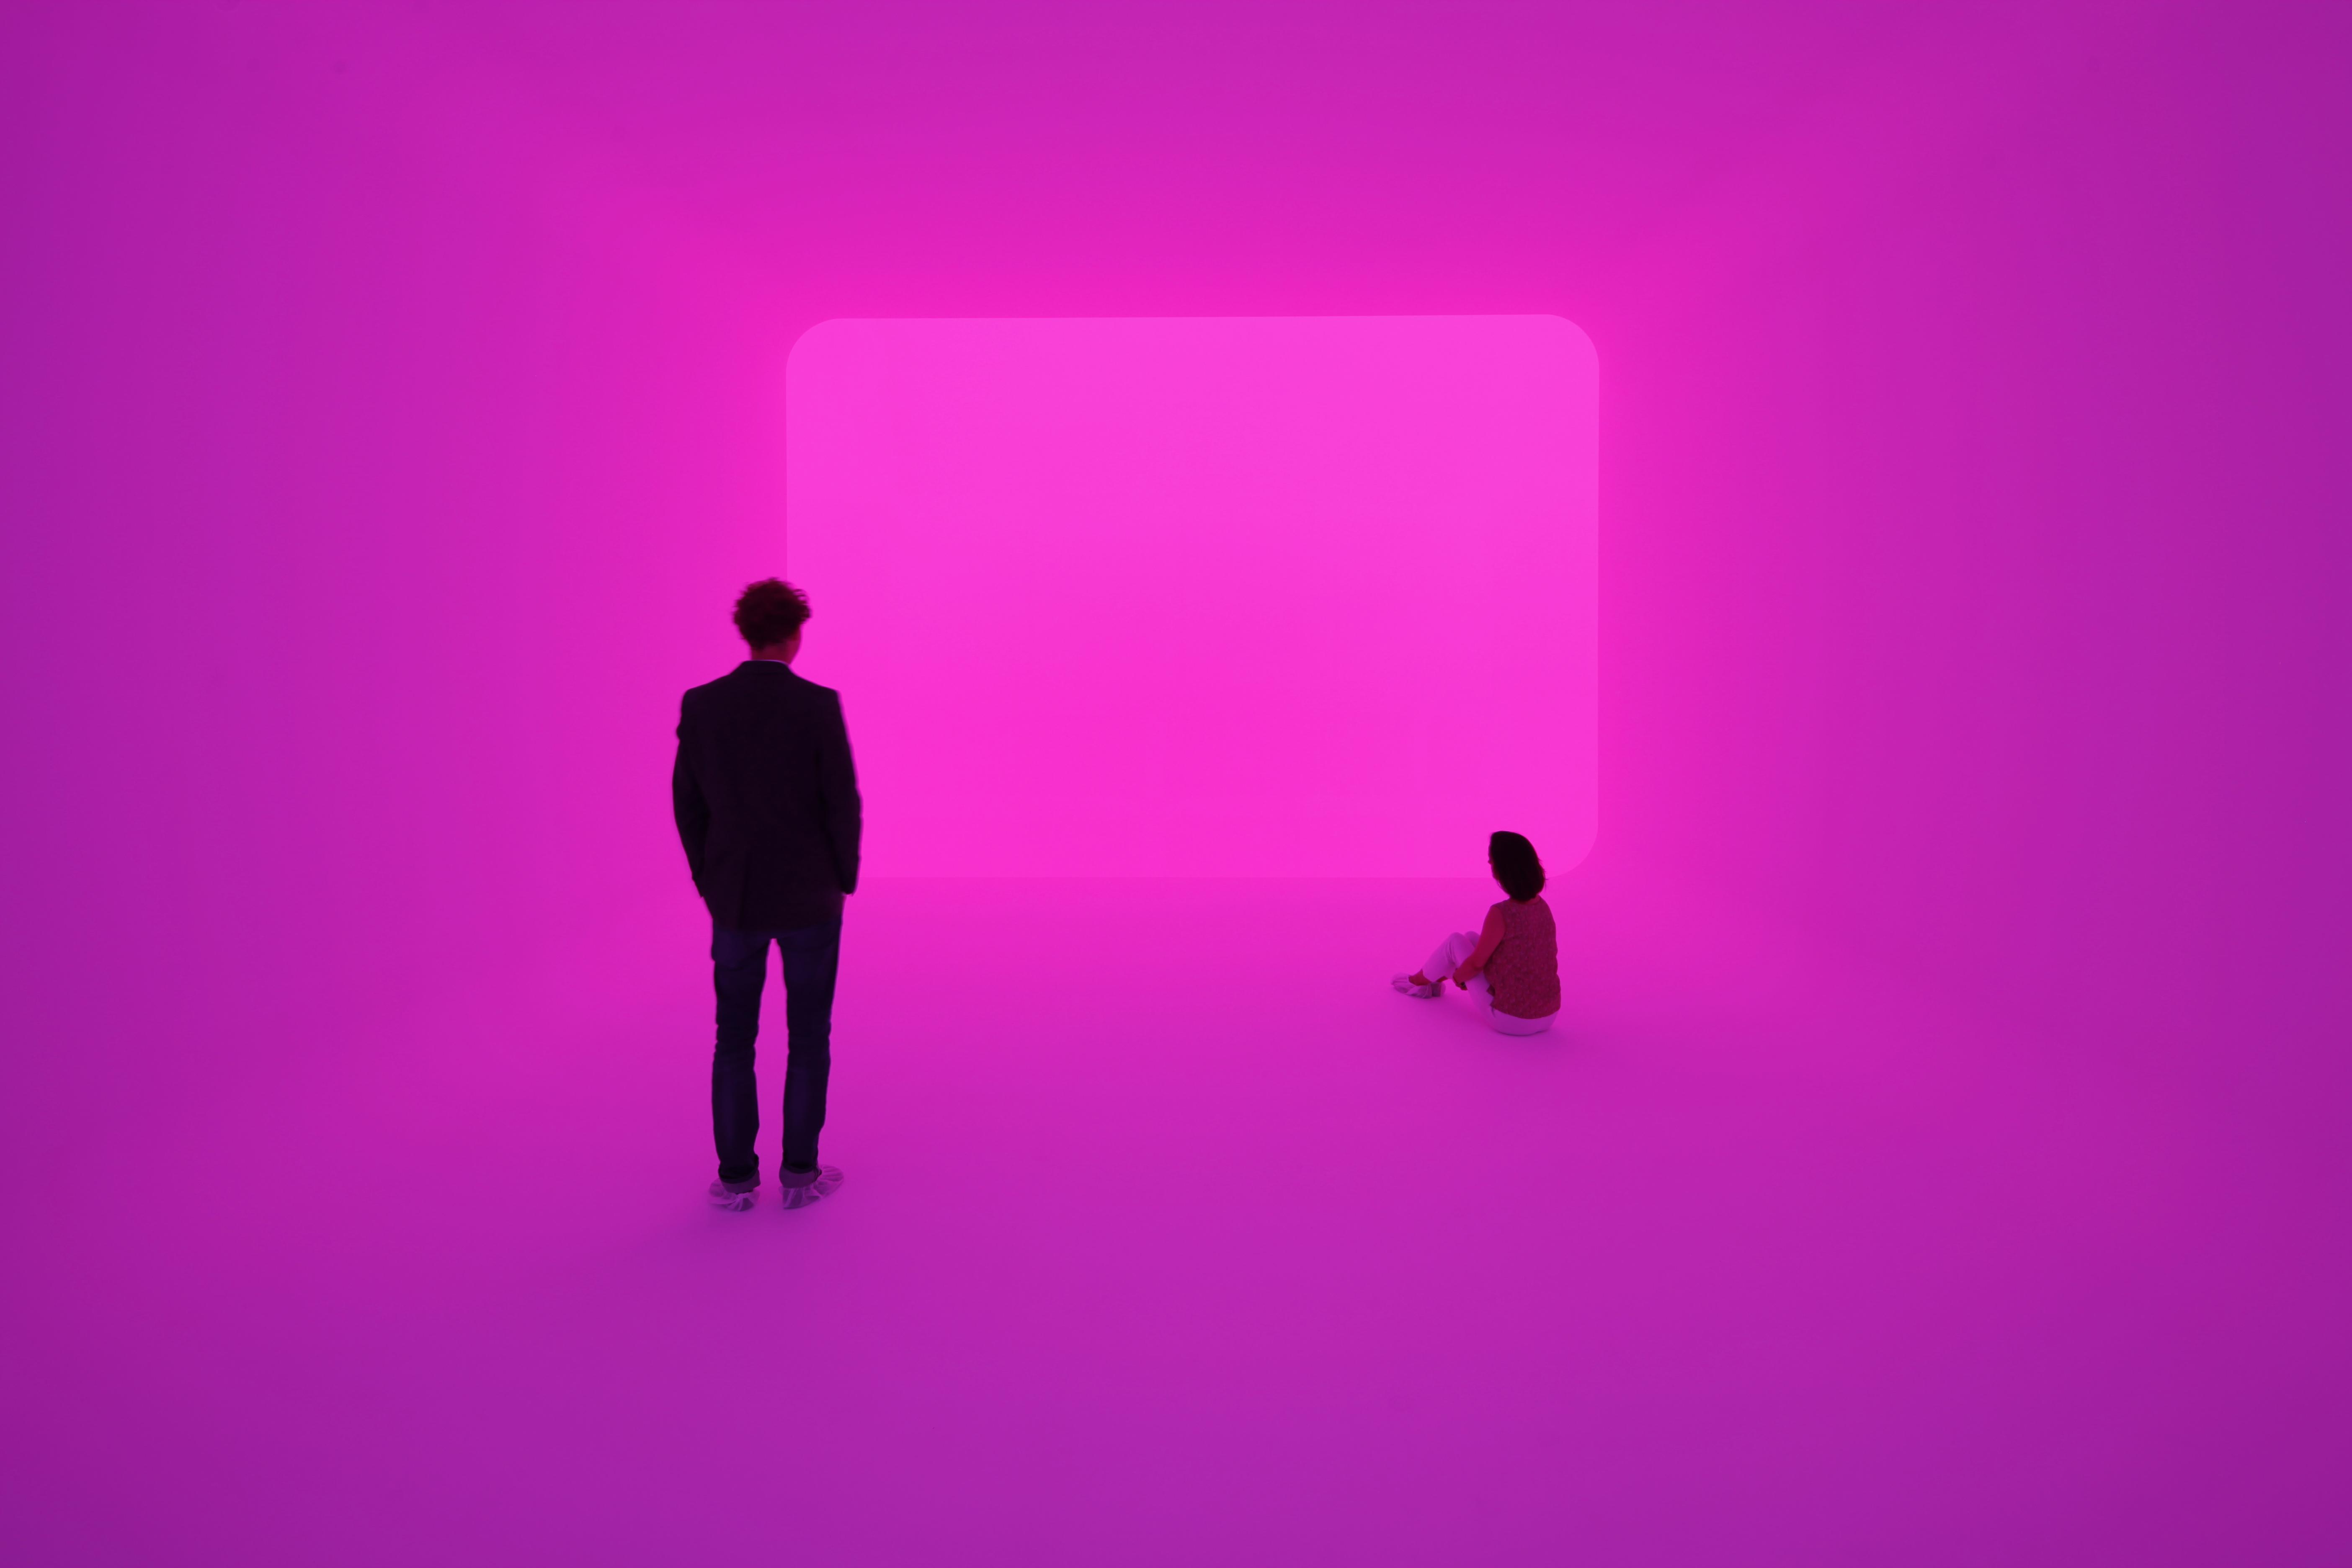 James Turrell, Ganzfeld APANI (Venice Biennial 2011), 2011, Installation, LED, 16 x 12 x 6m, Foto: Florian Holzherr ; Courtesy Häusler Contemporary München   Zürich